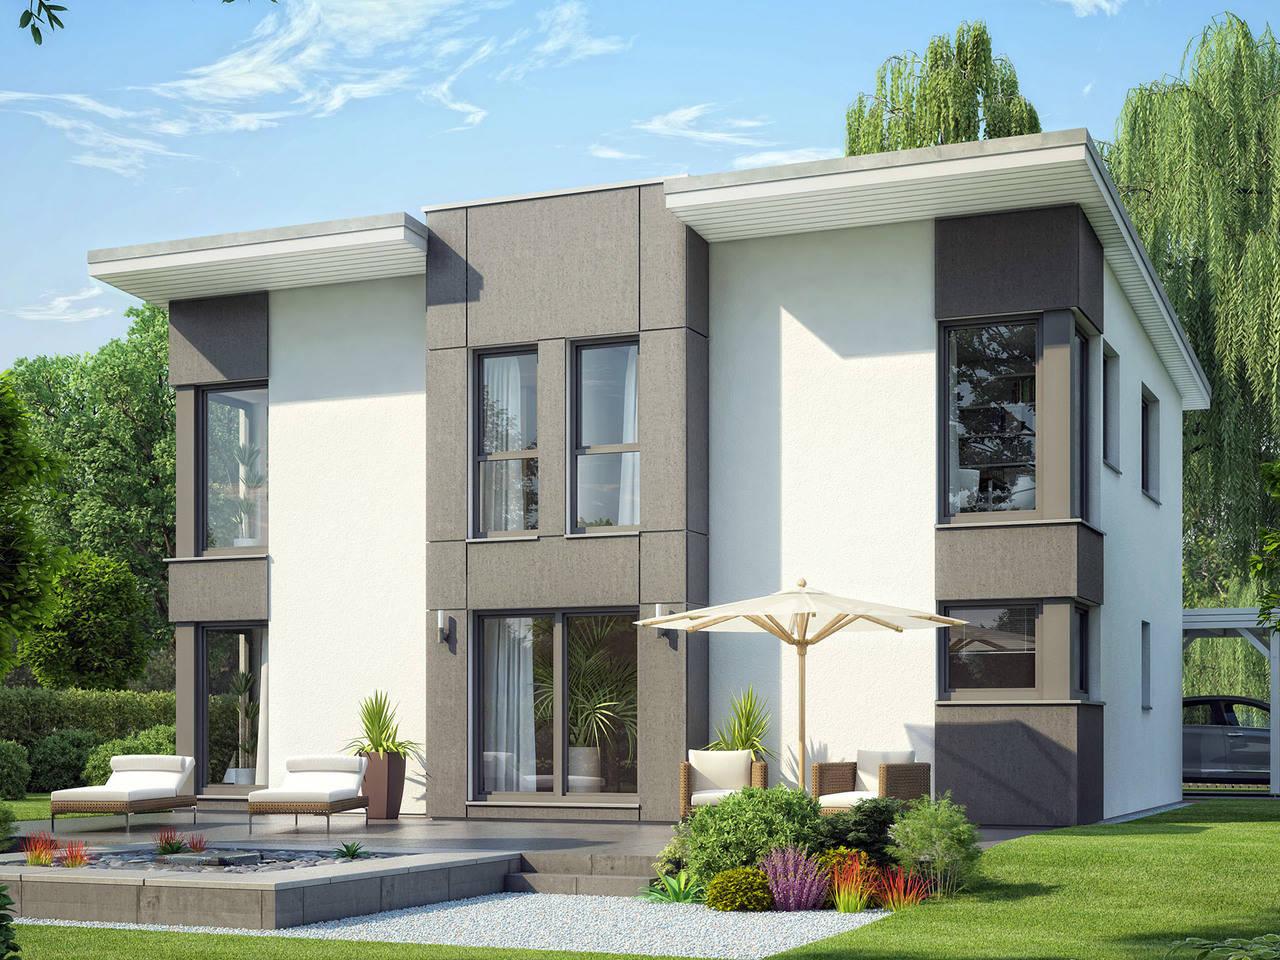 Evolution 148 V9 – Einfamilienhaus Variante A